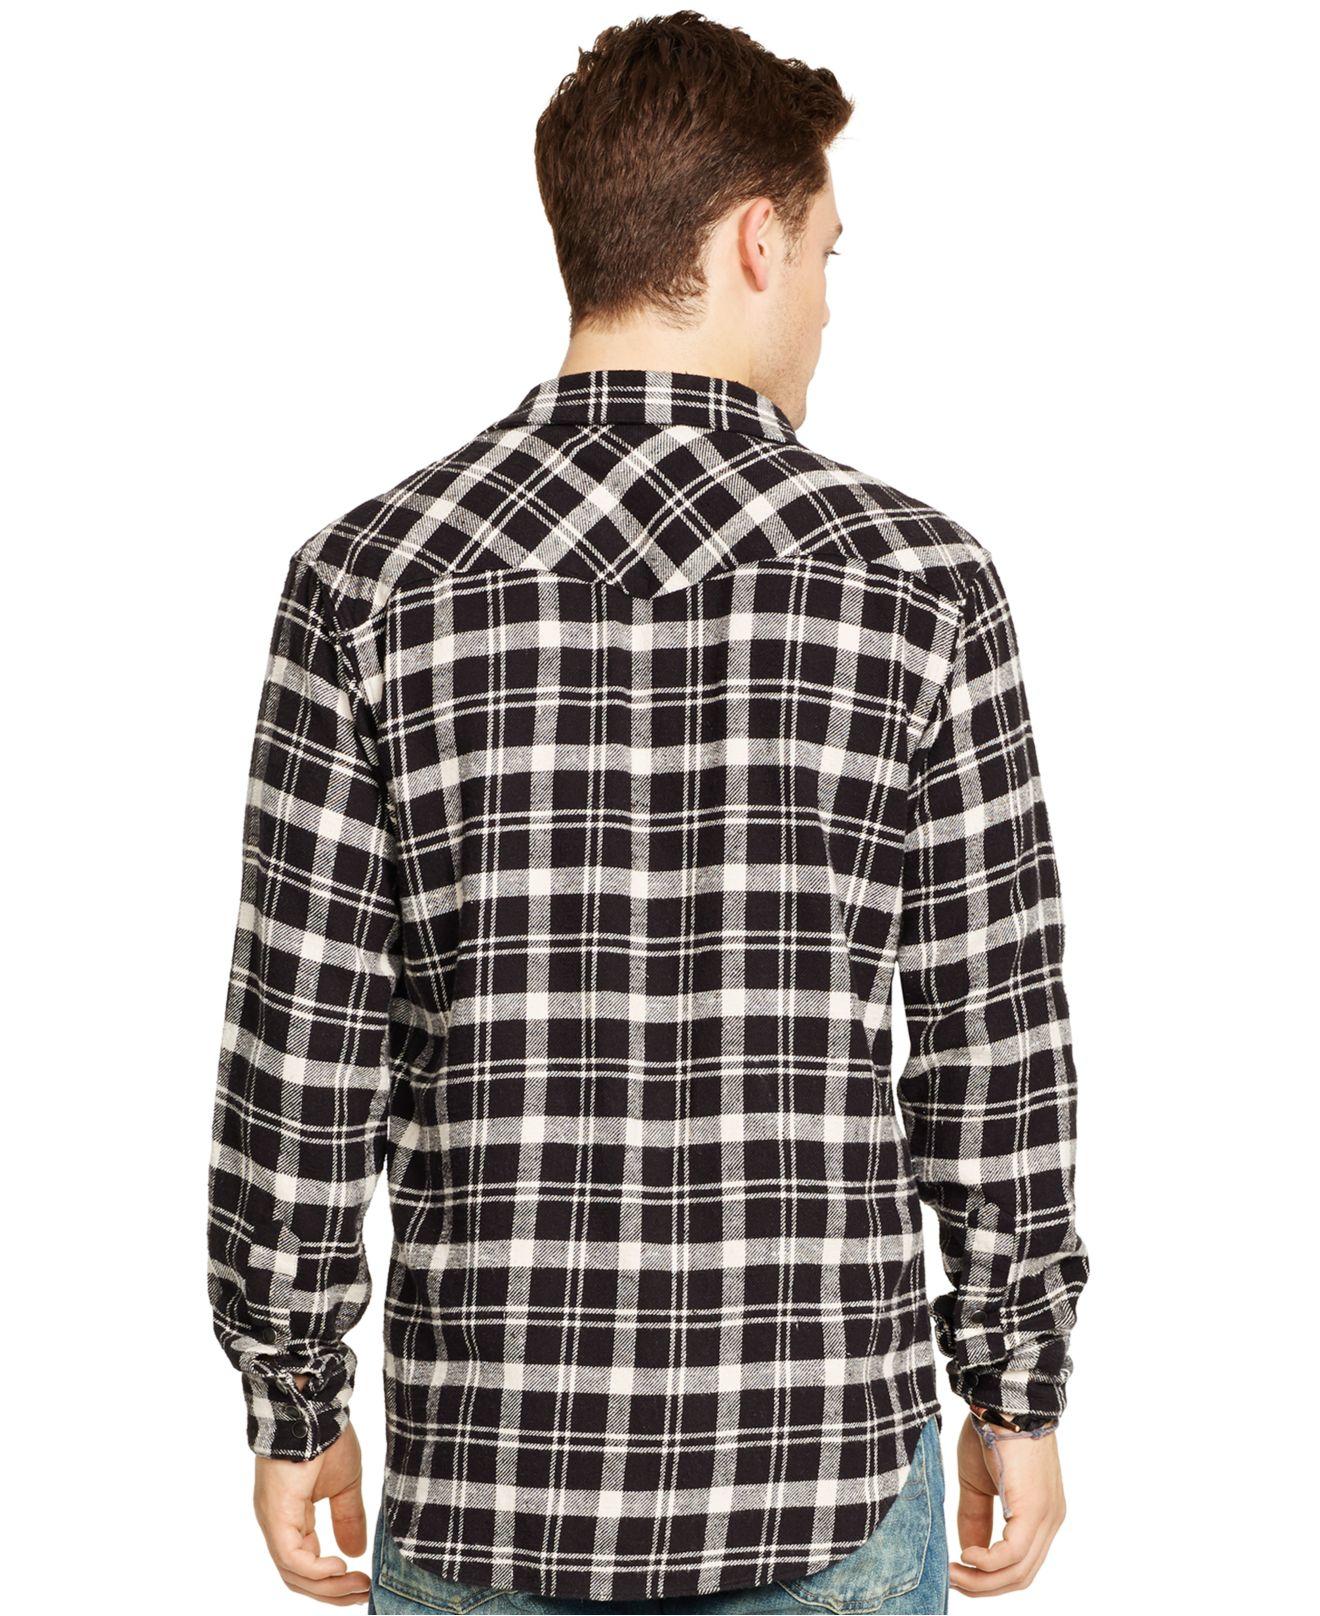 Polo ralph lauren buffalo plaid western shirt in black for for Buffalo plaid men s shirt